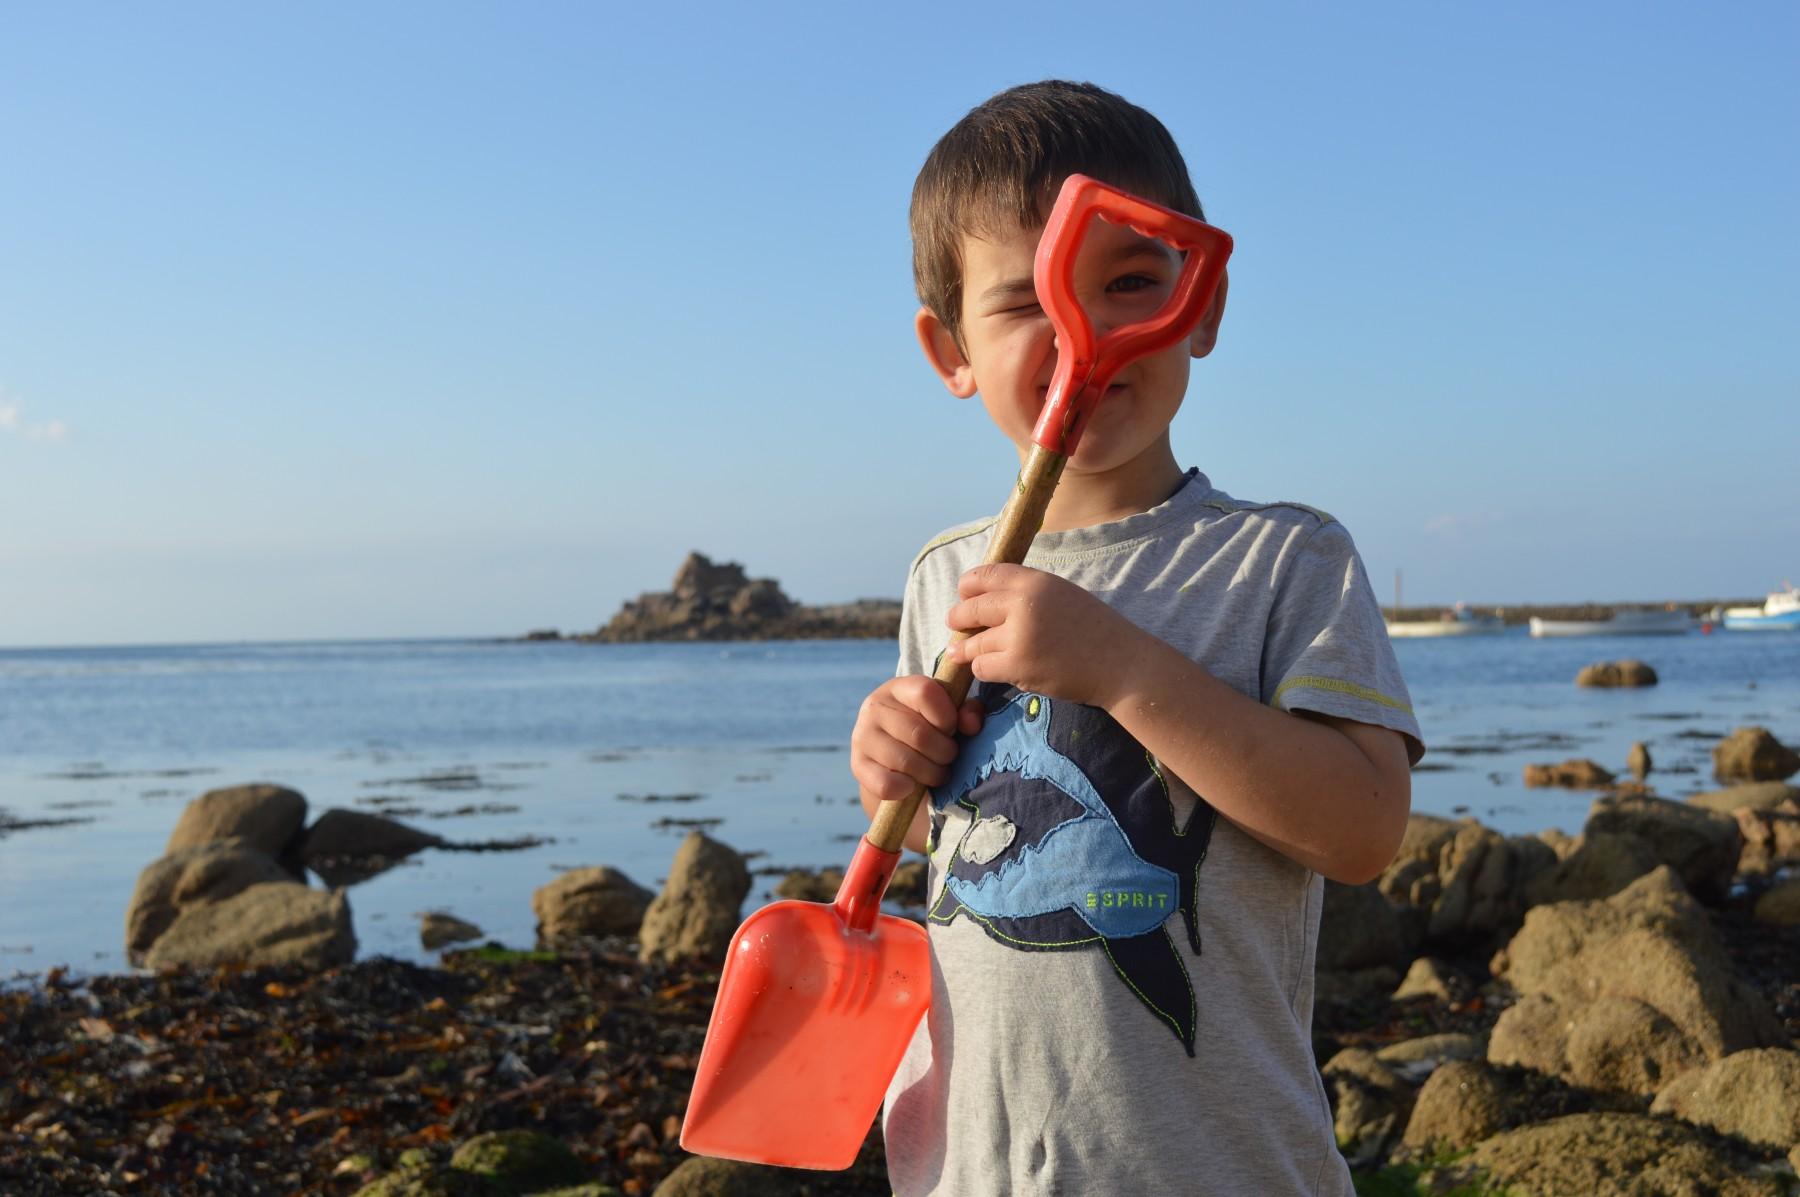 Little boy with spade